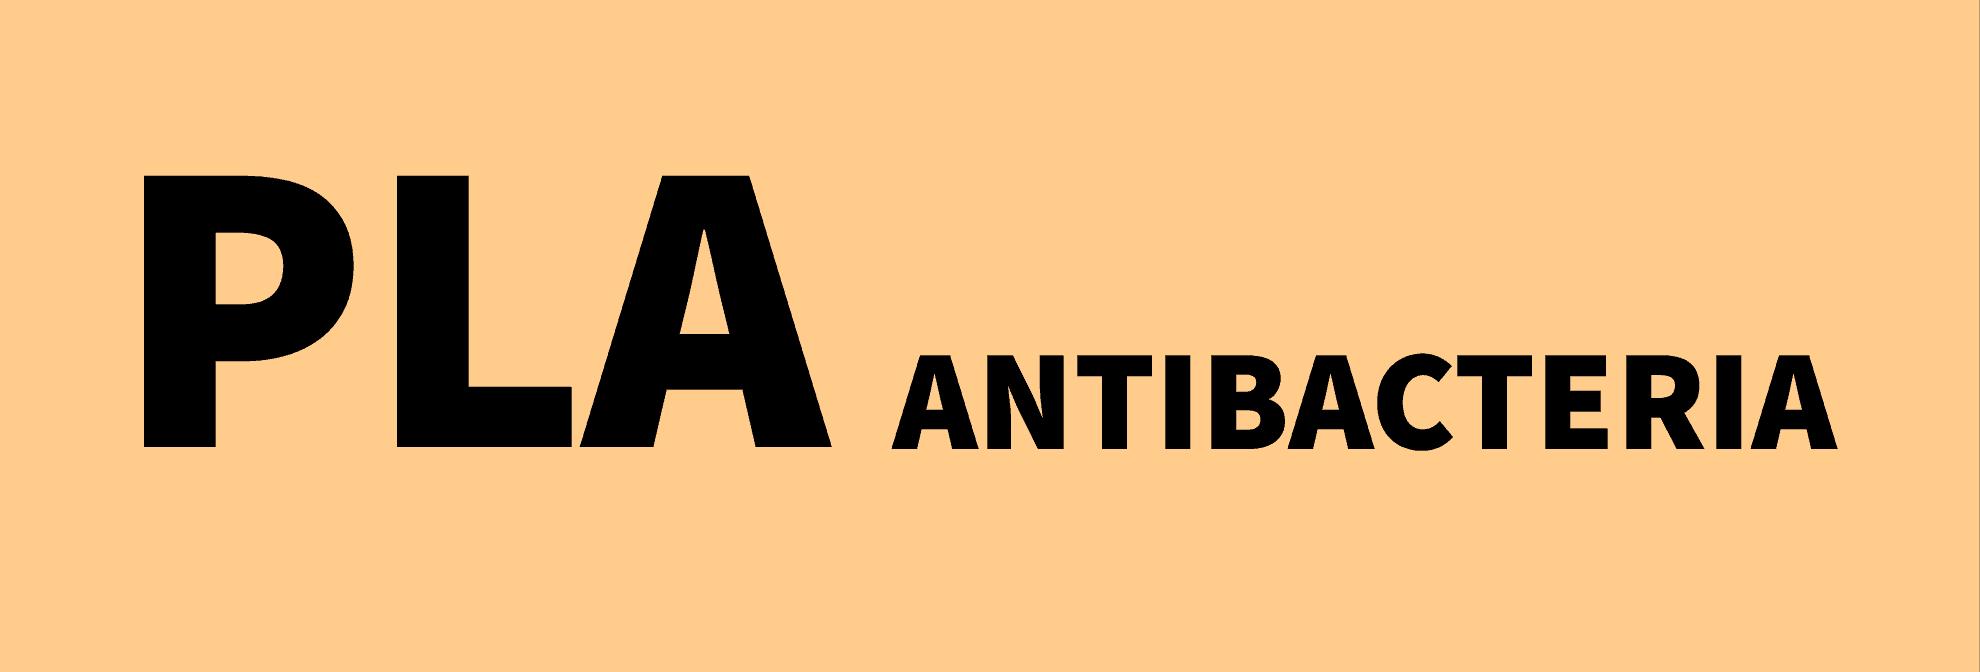 PLA Antibacteria website@2x